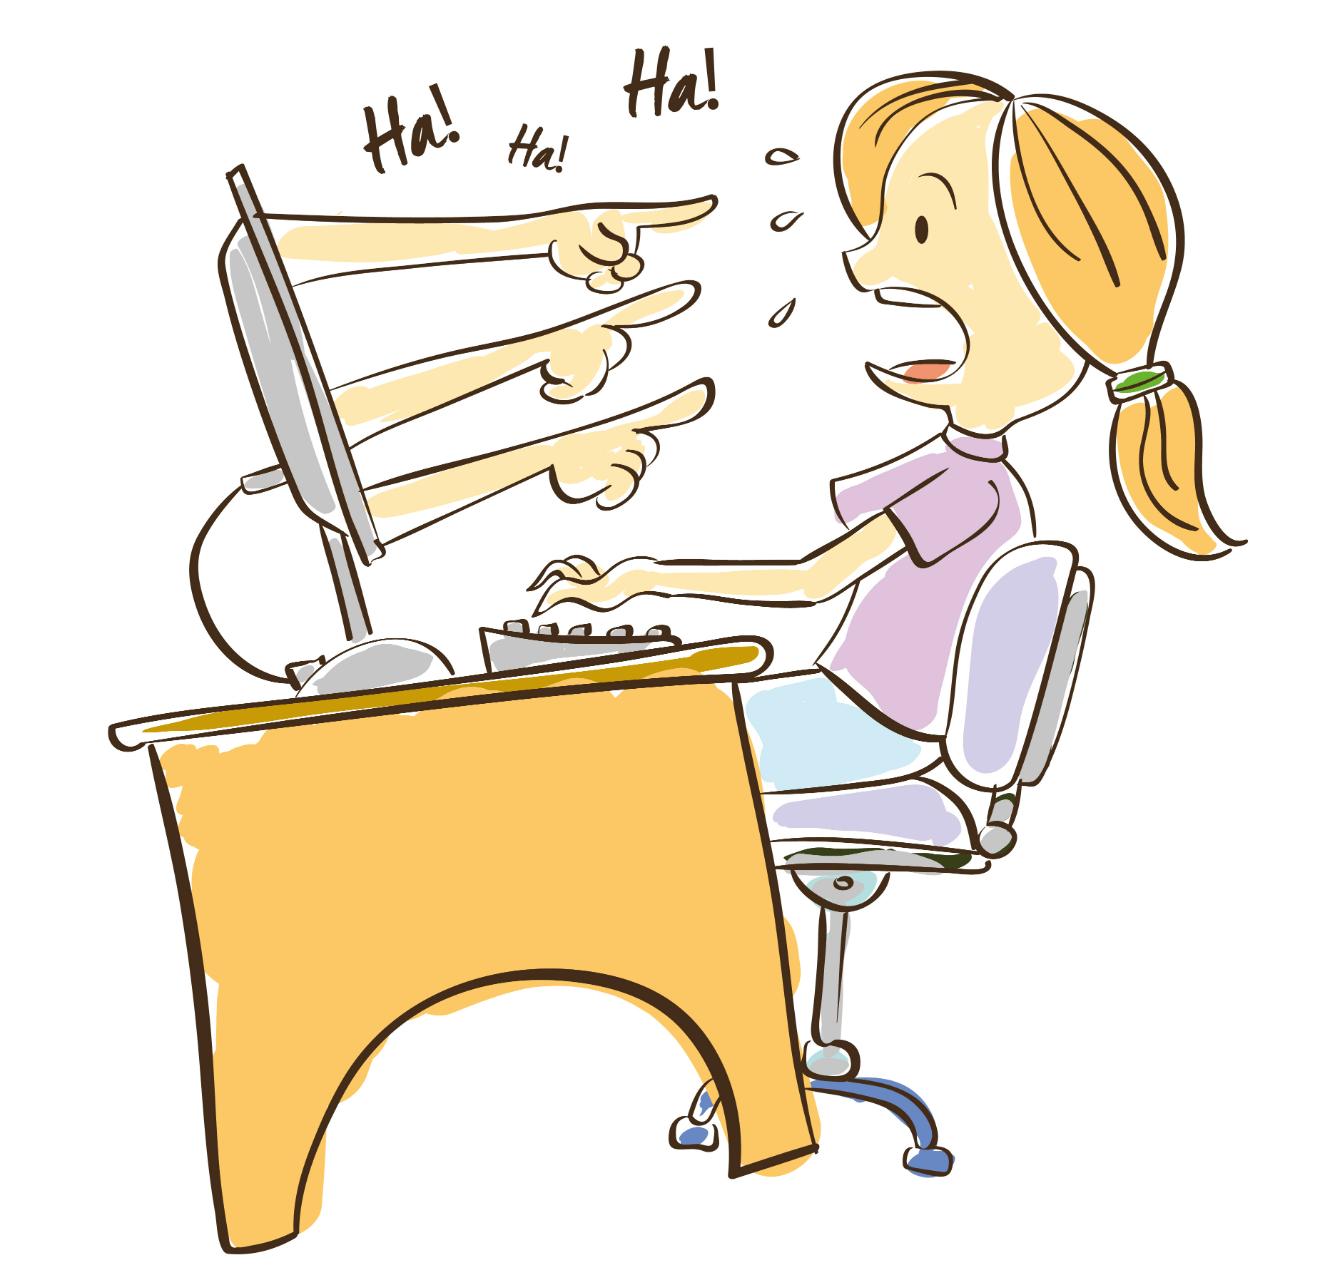 Bullying clipart computer. Pin on social media